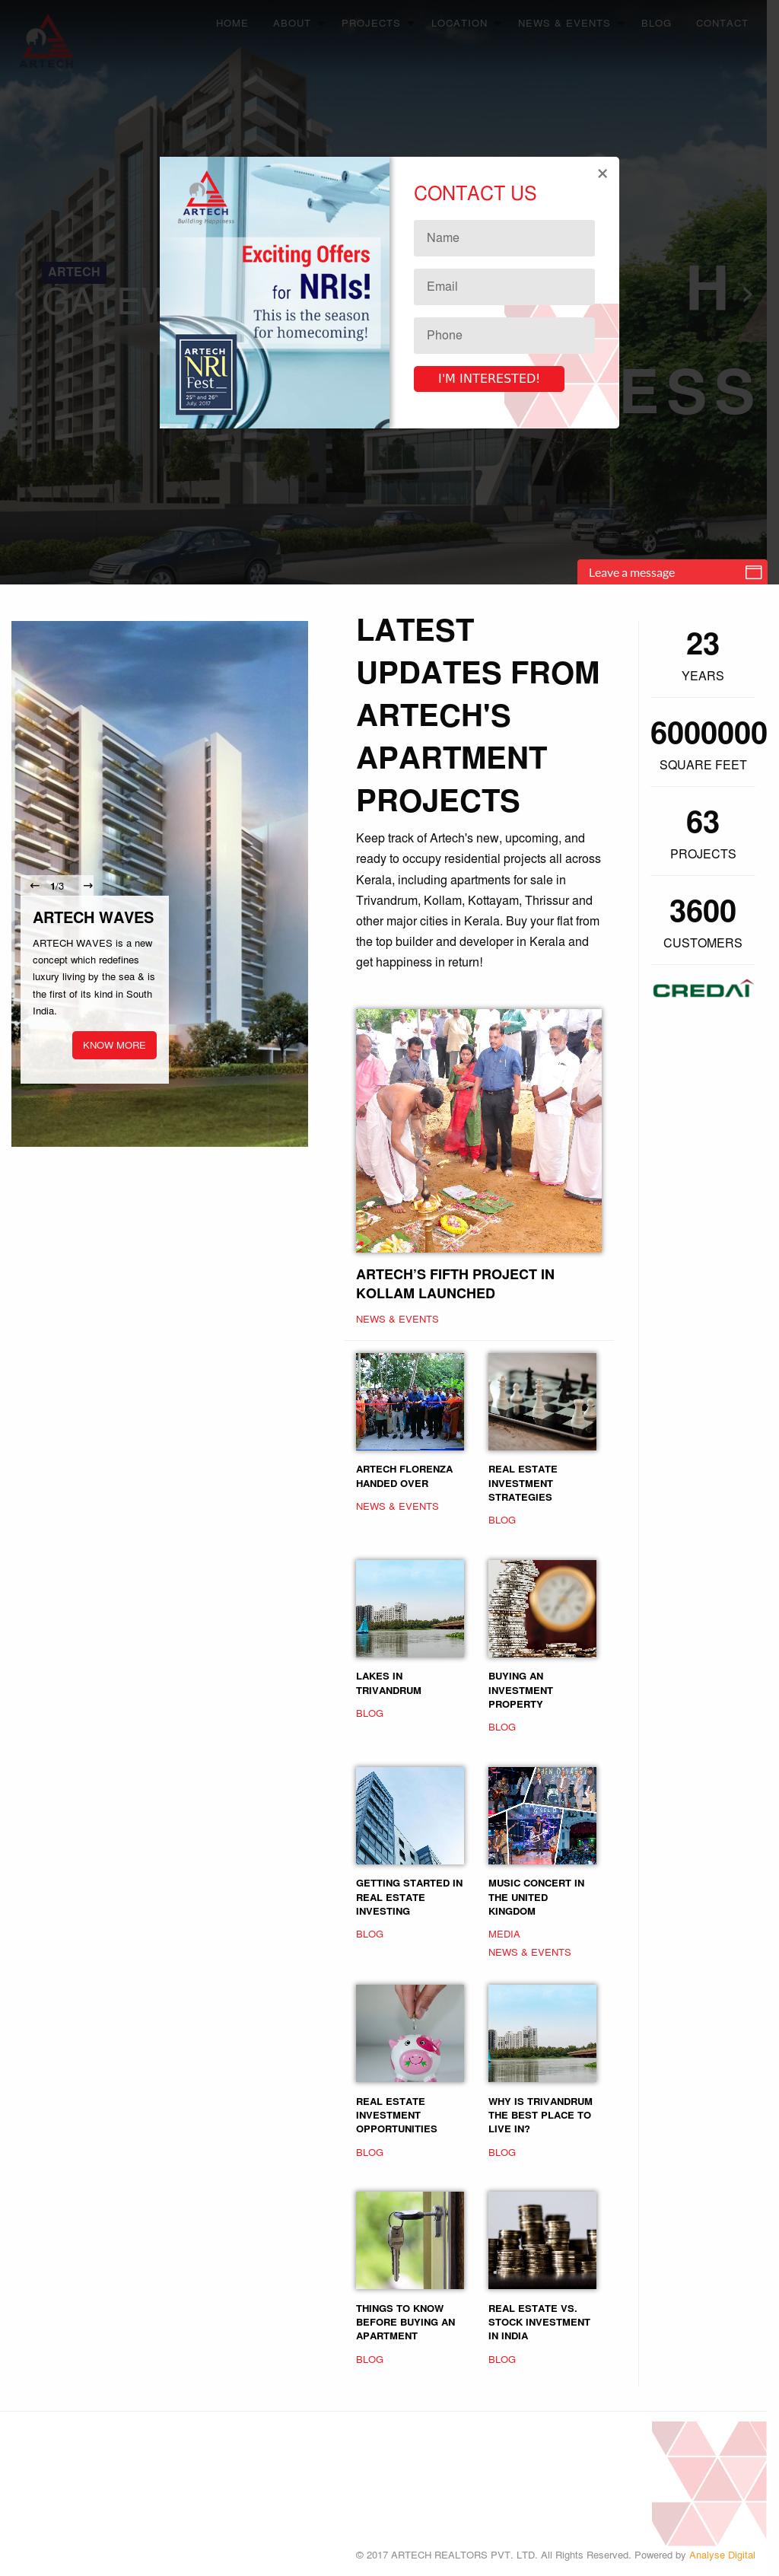 Artech Realtors Competitors, Revenue and Employees - Owler Company